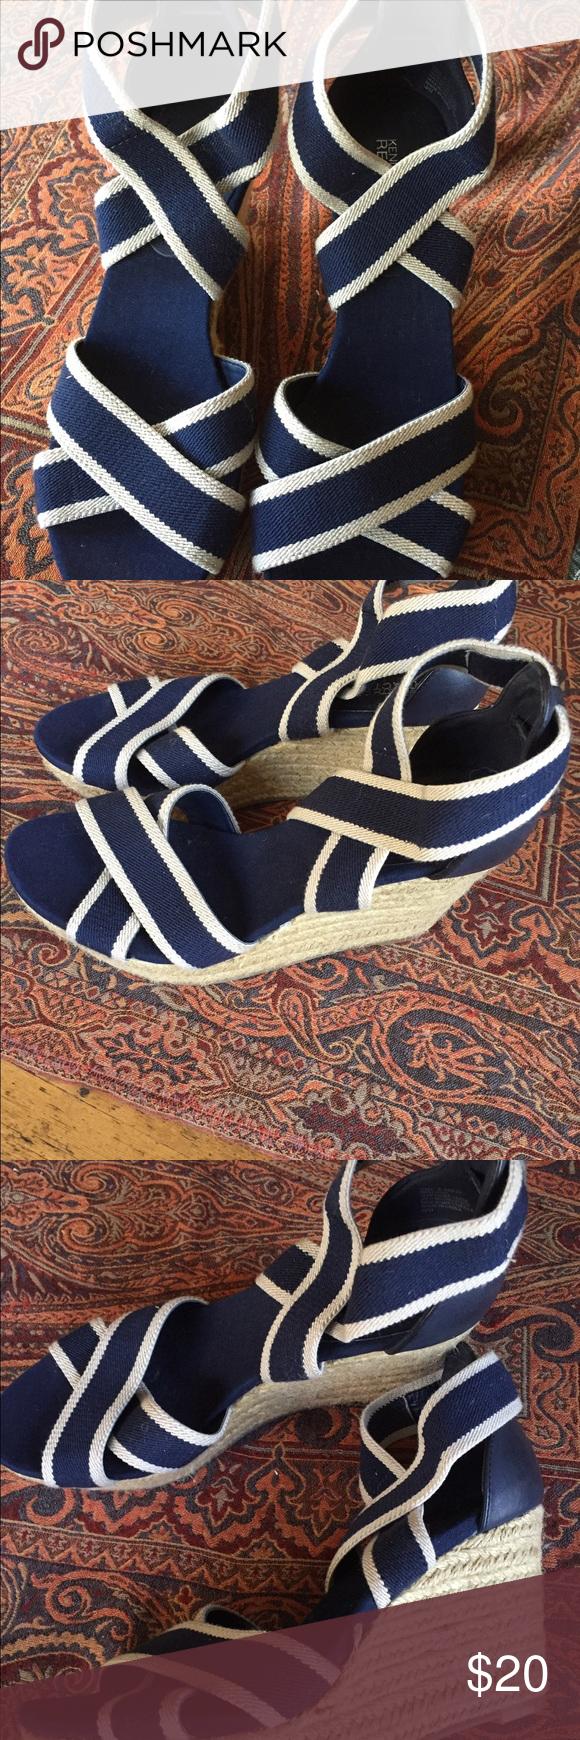 "Reaction platform shoes Never worn platform shoes in navy with ecru woven trim and weave on platform. Top straps have elastic for snug fit. Size 8. 3.25"" platform. Kenneth Cole Reaction Shoes Platforms"